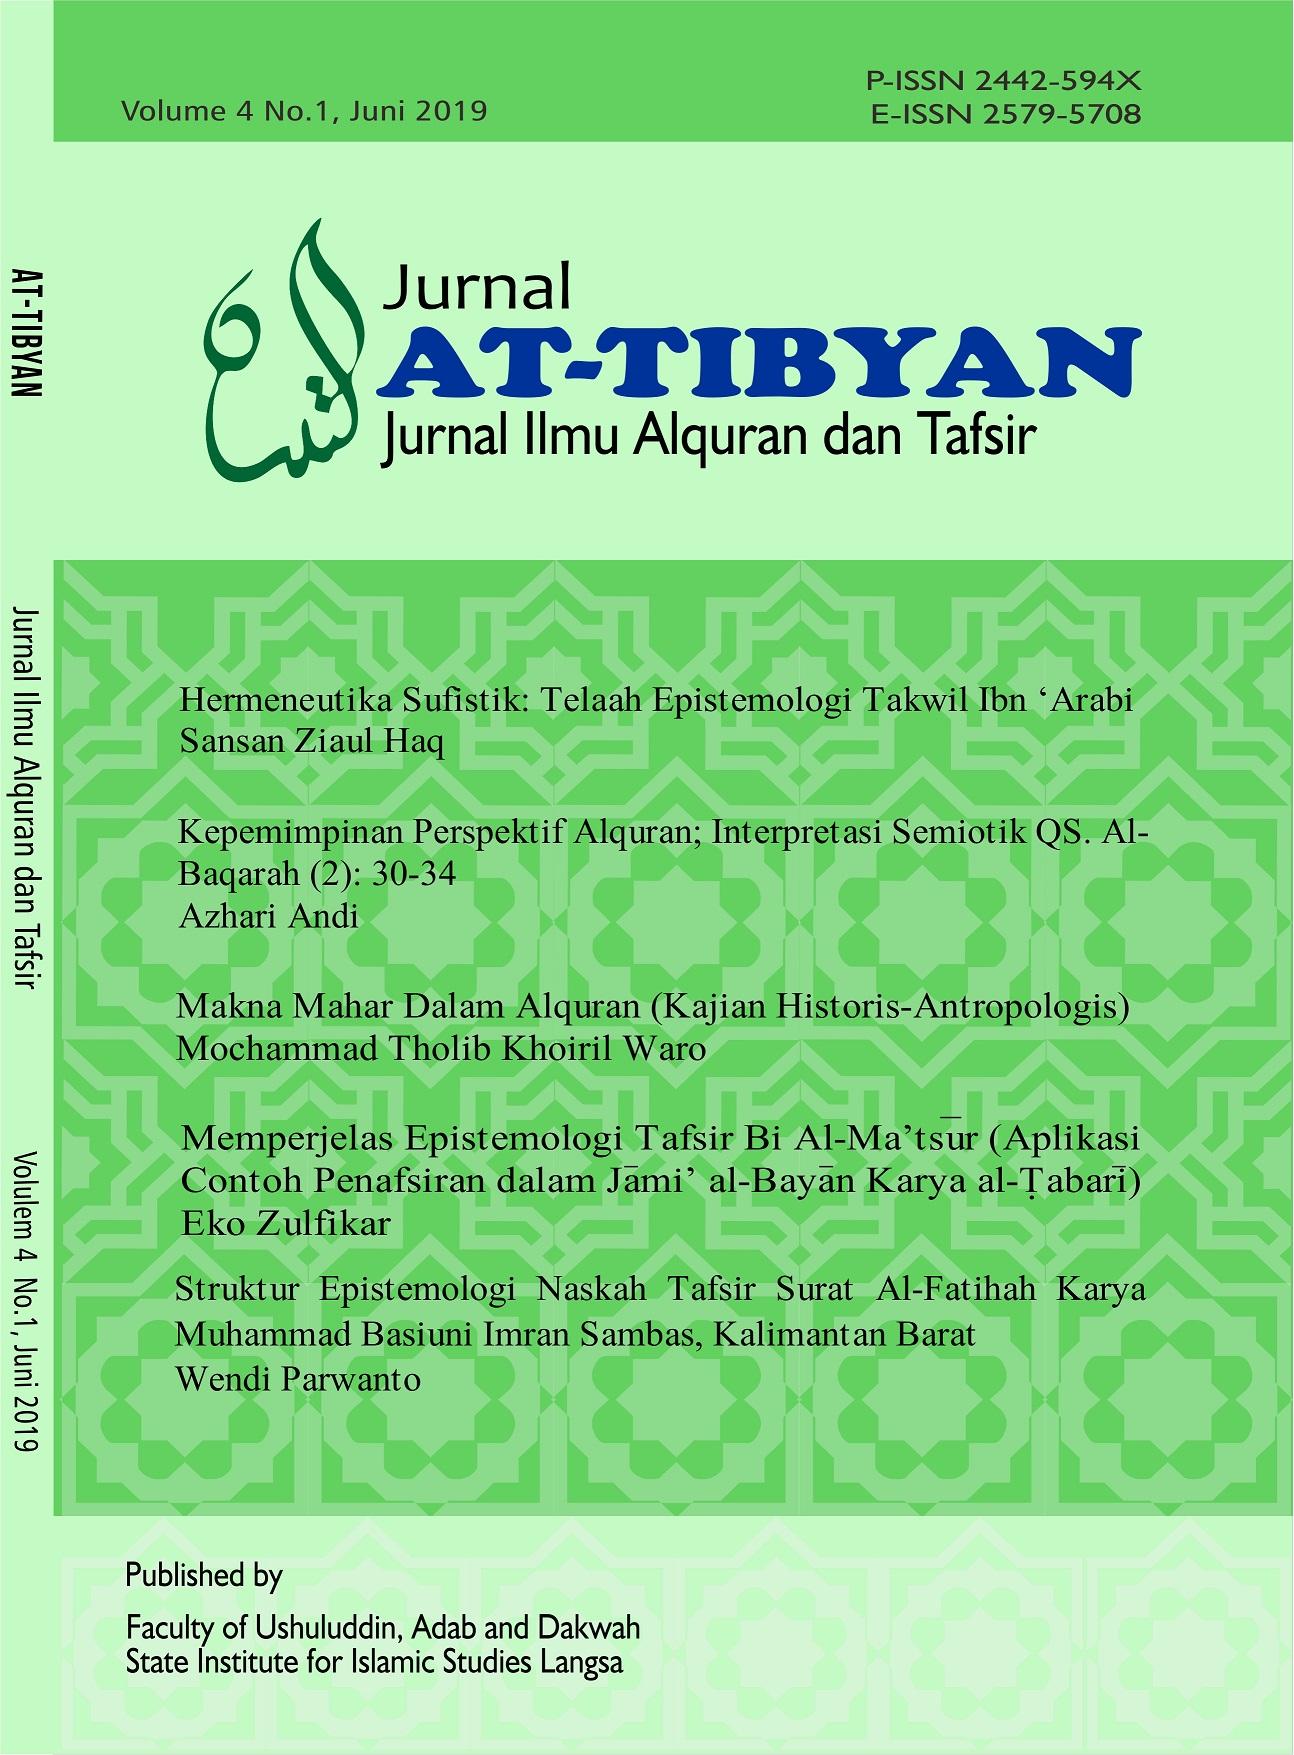 Implementasi Qiraat Sab Ah Dalam Qiraat Alquran Jurnal At Tibyan Jurnal Ilmu Alqur An Dan Tafsir